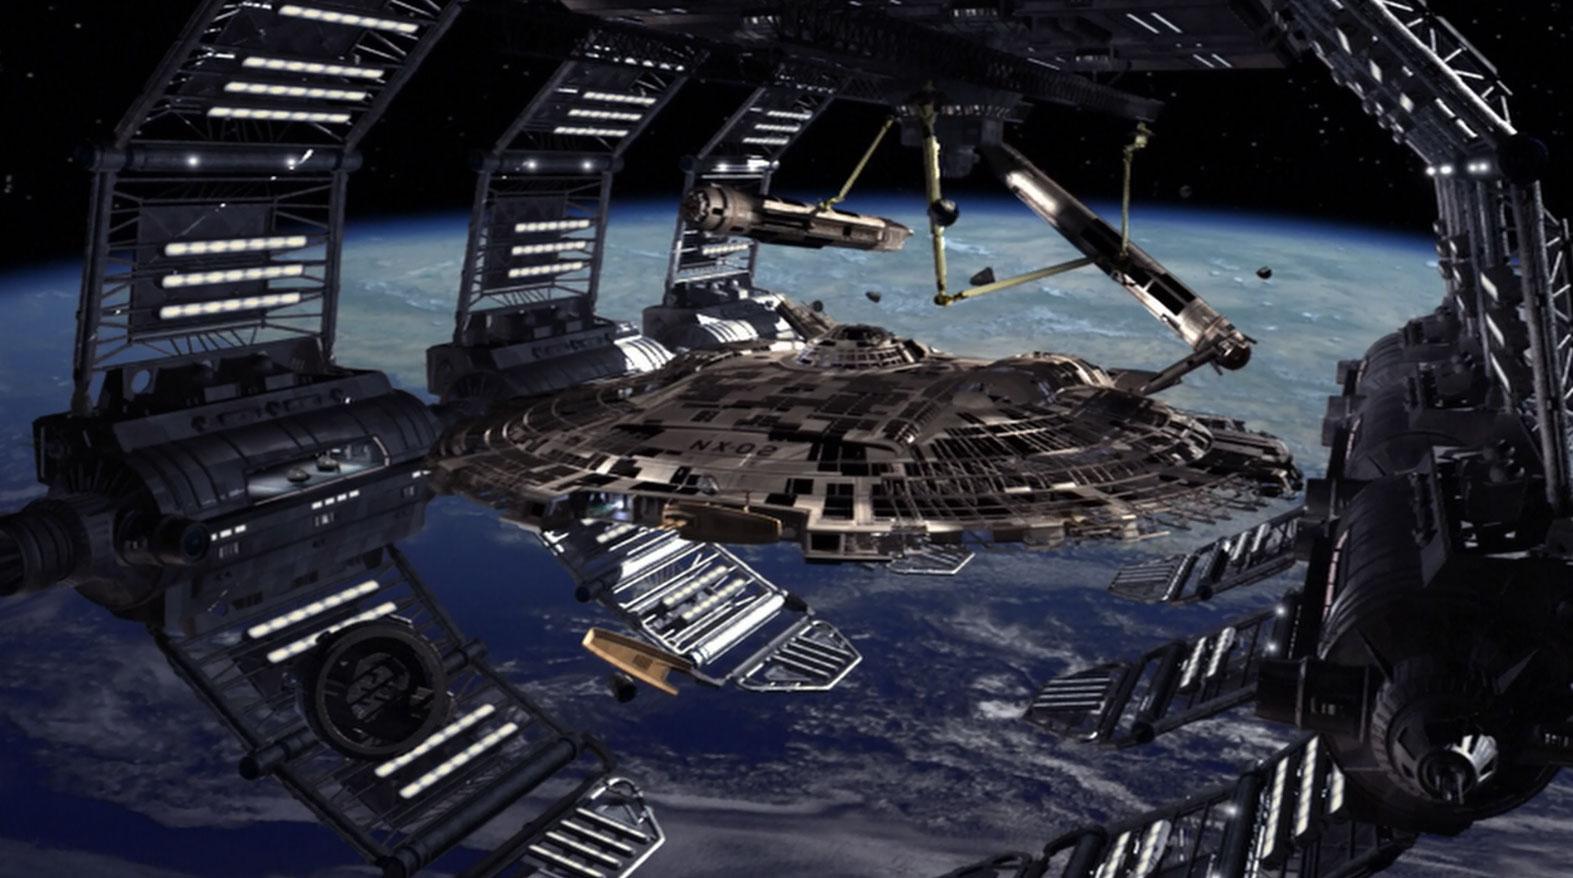 Earth spacedocks